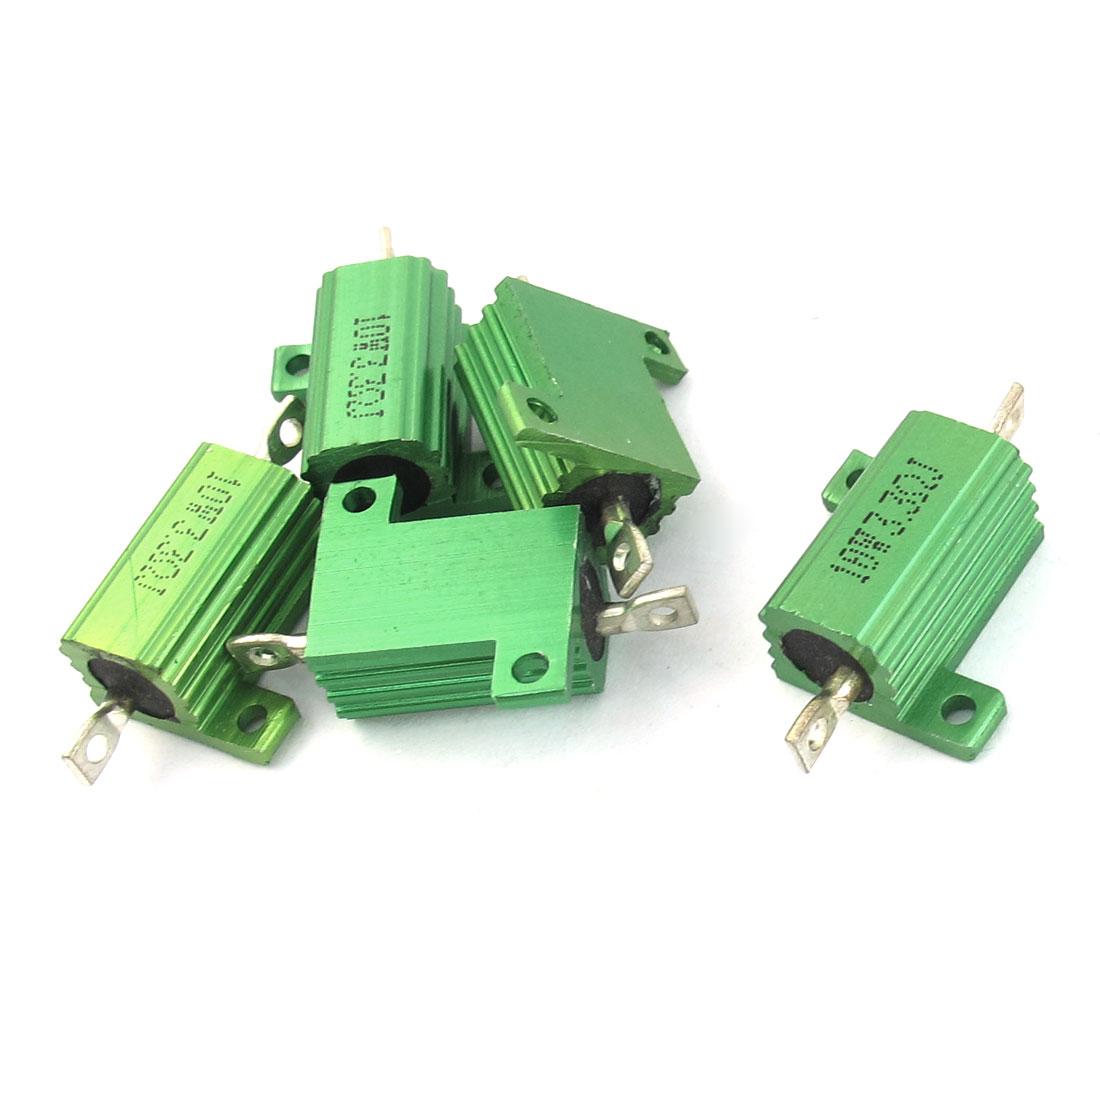 10Watt 3.3 Ohm 5% Aluminum Shell Clad Wire Wound Power Resistors Green 5Pcs